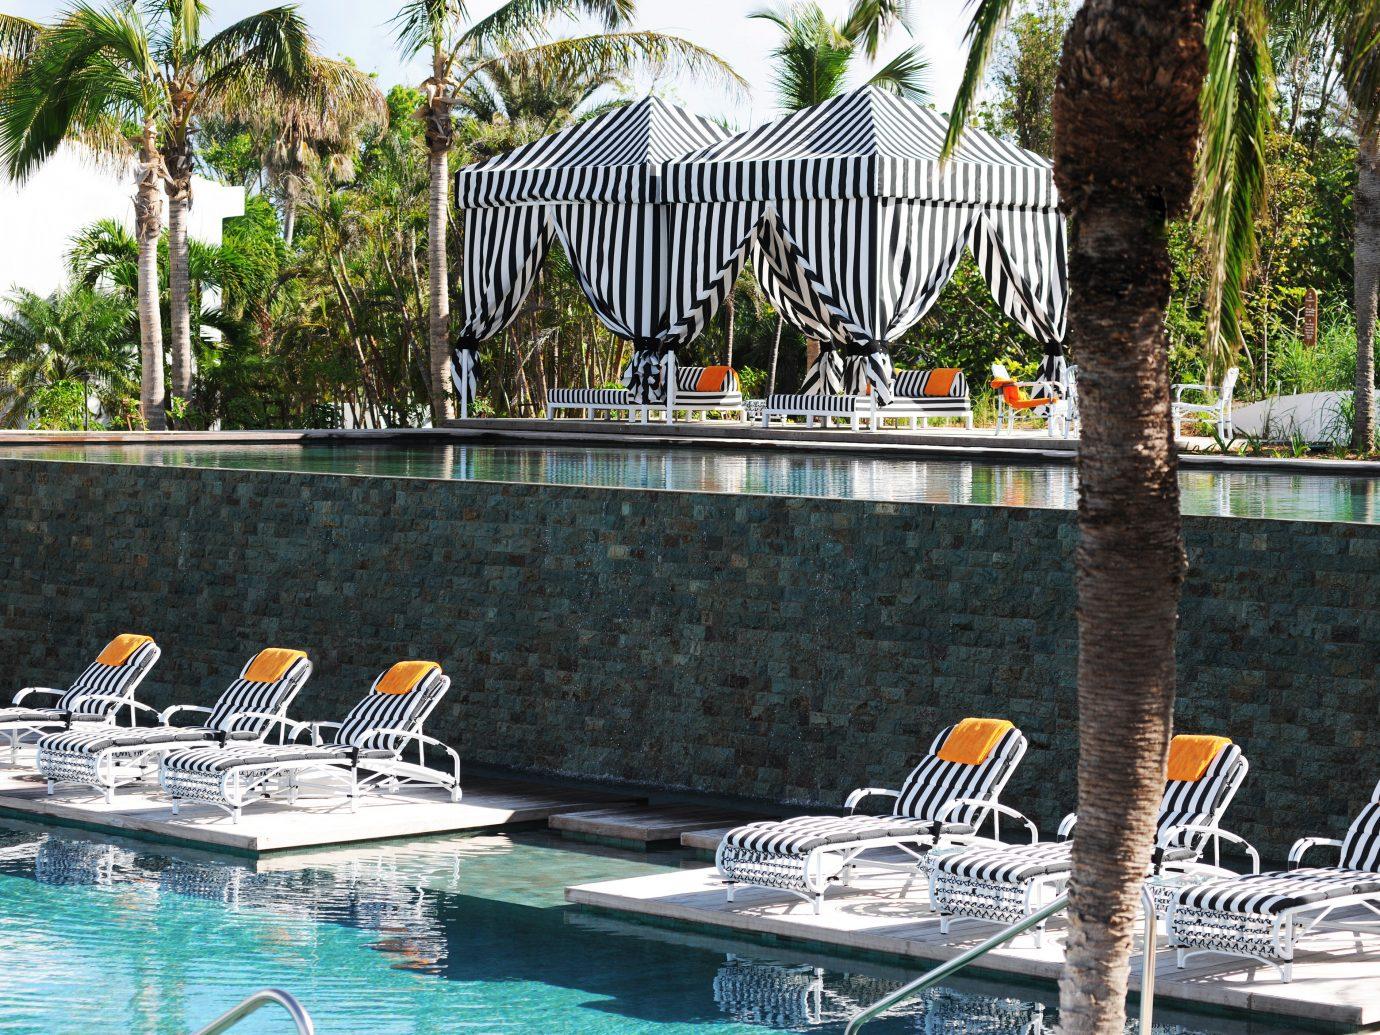 Beach Beachfront Deck Island Lounge Pool Scenic views Trip Ideas Waterfront tree leisure outdoor swimming pool Resort